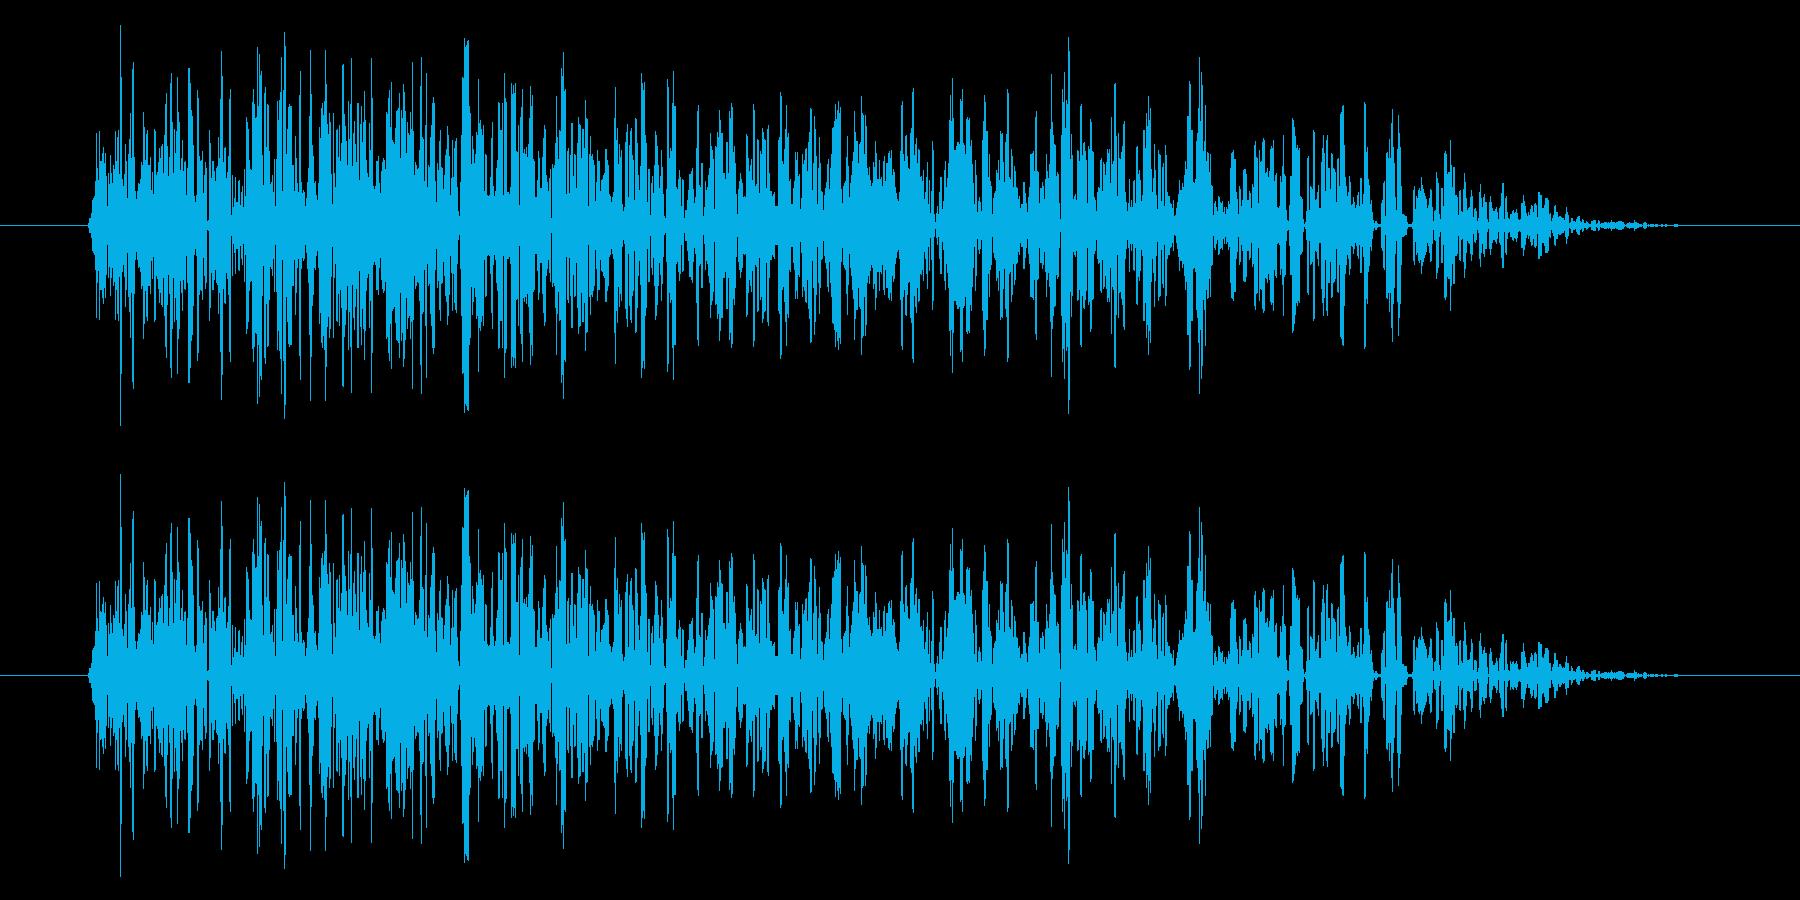 SNES シューティング02-06(ミサの再生済みの波形